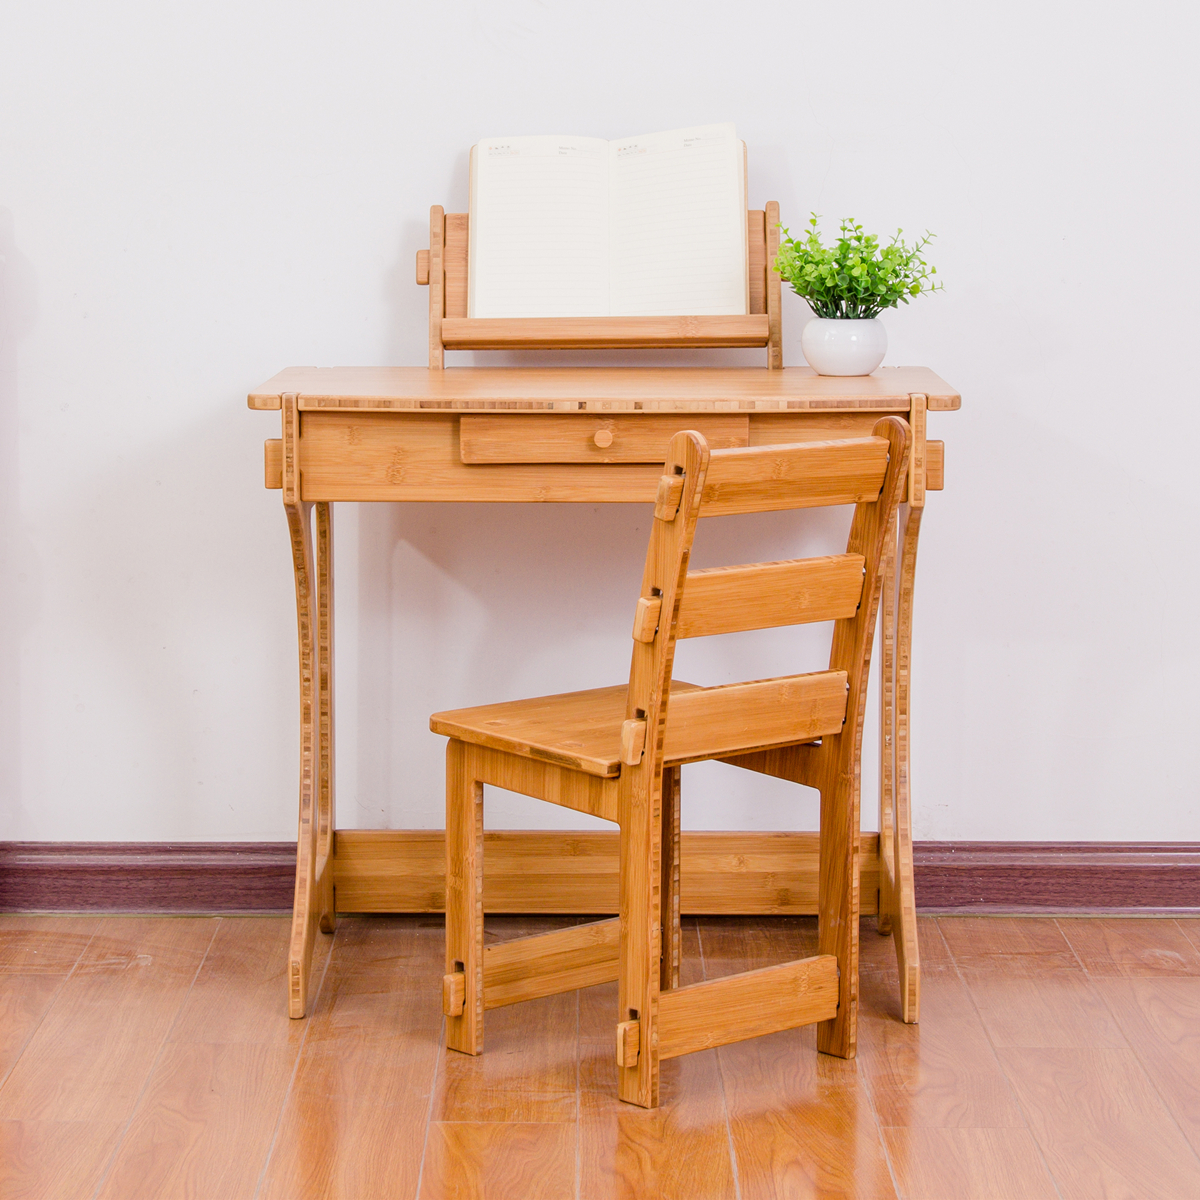 Eco Friendly Screwless Bamboo Wooden Children Kids Study Table Desk